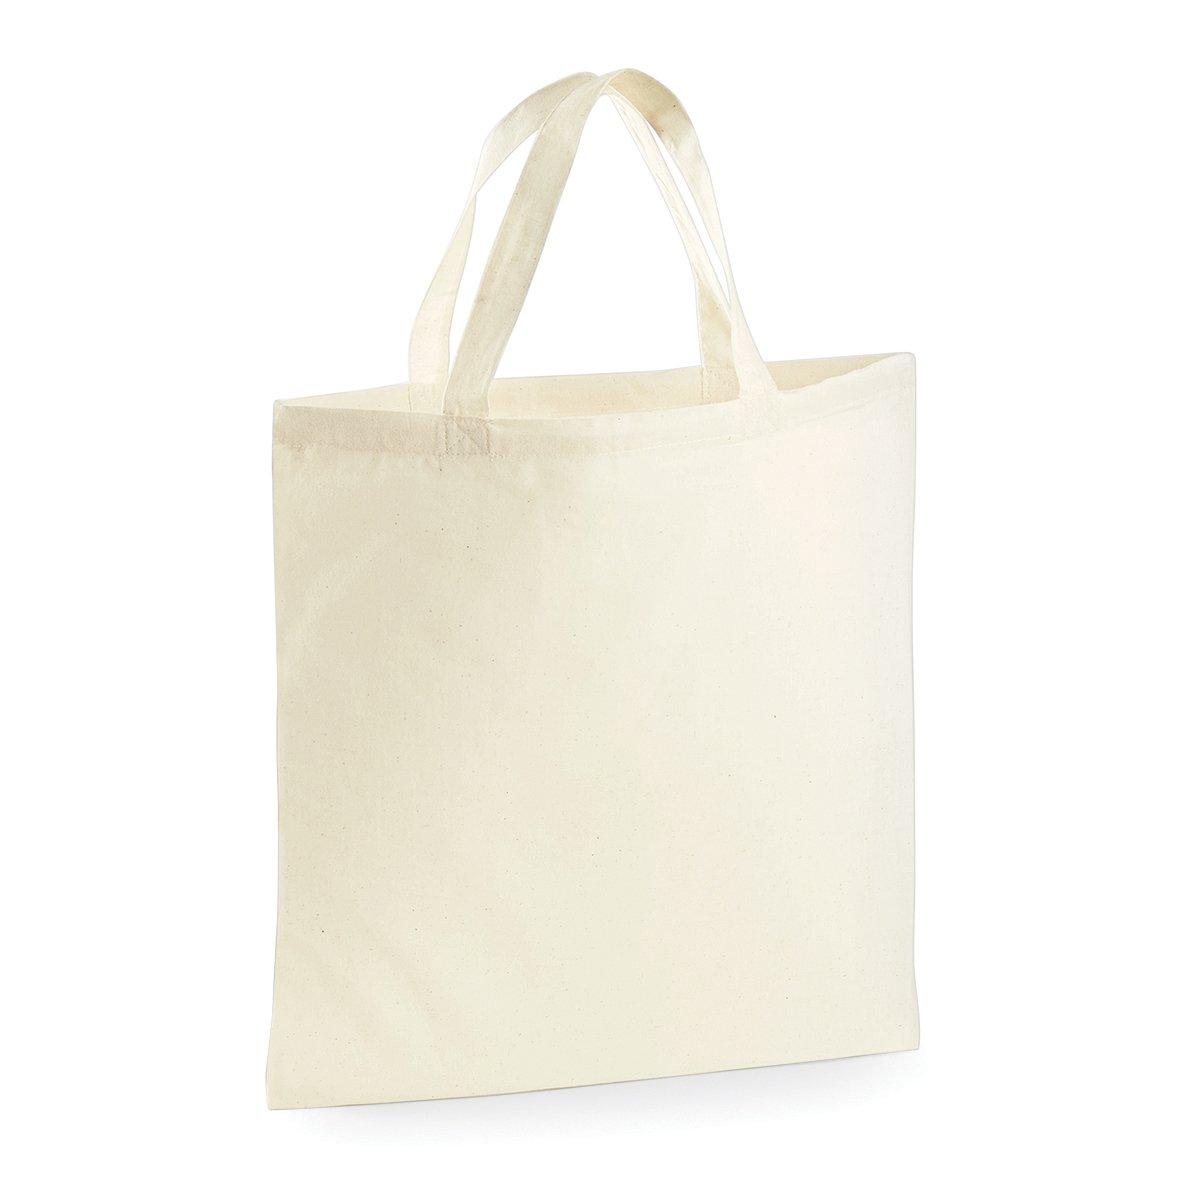 Westford Mill Short Handle Bag For Life